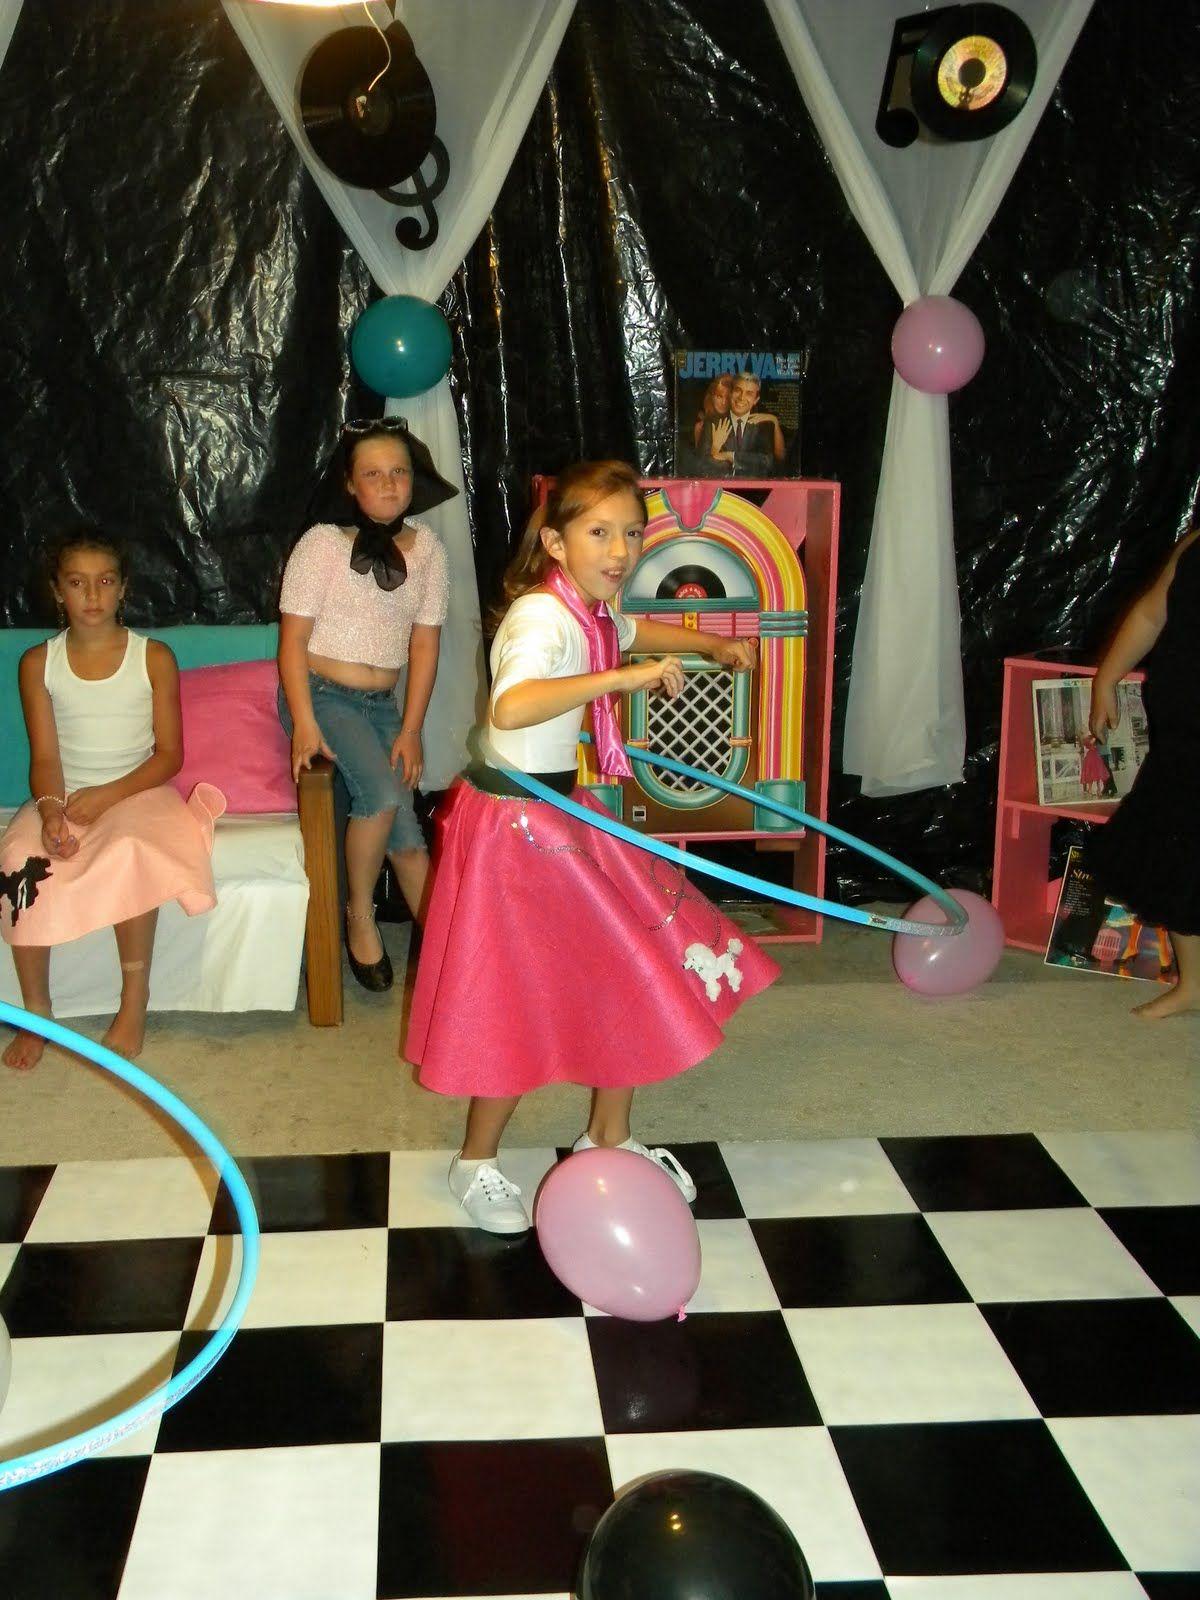 Hula Hoop Contest Checkerboard Dance Floor Black